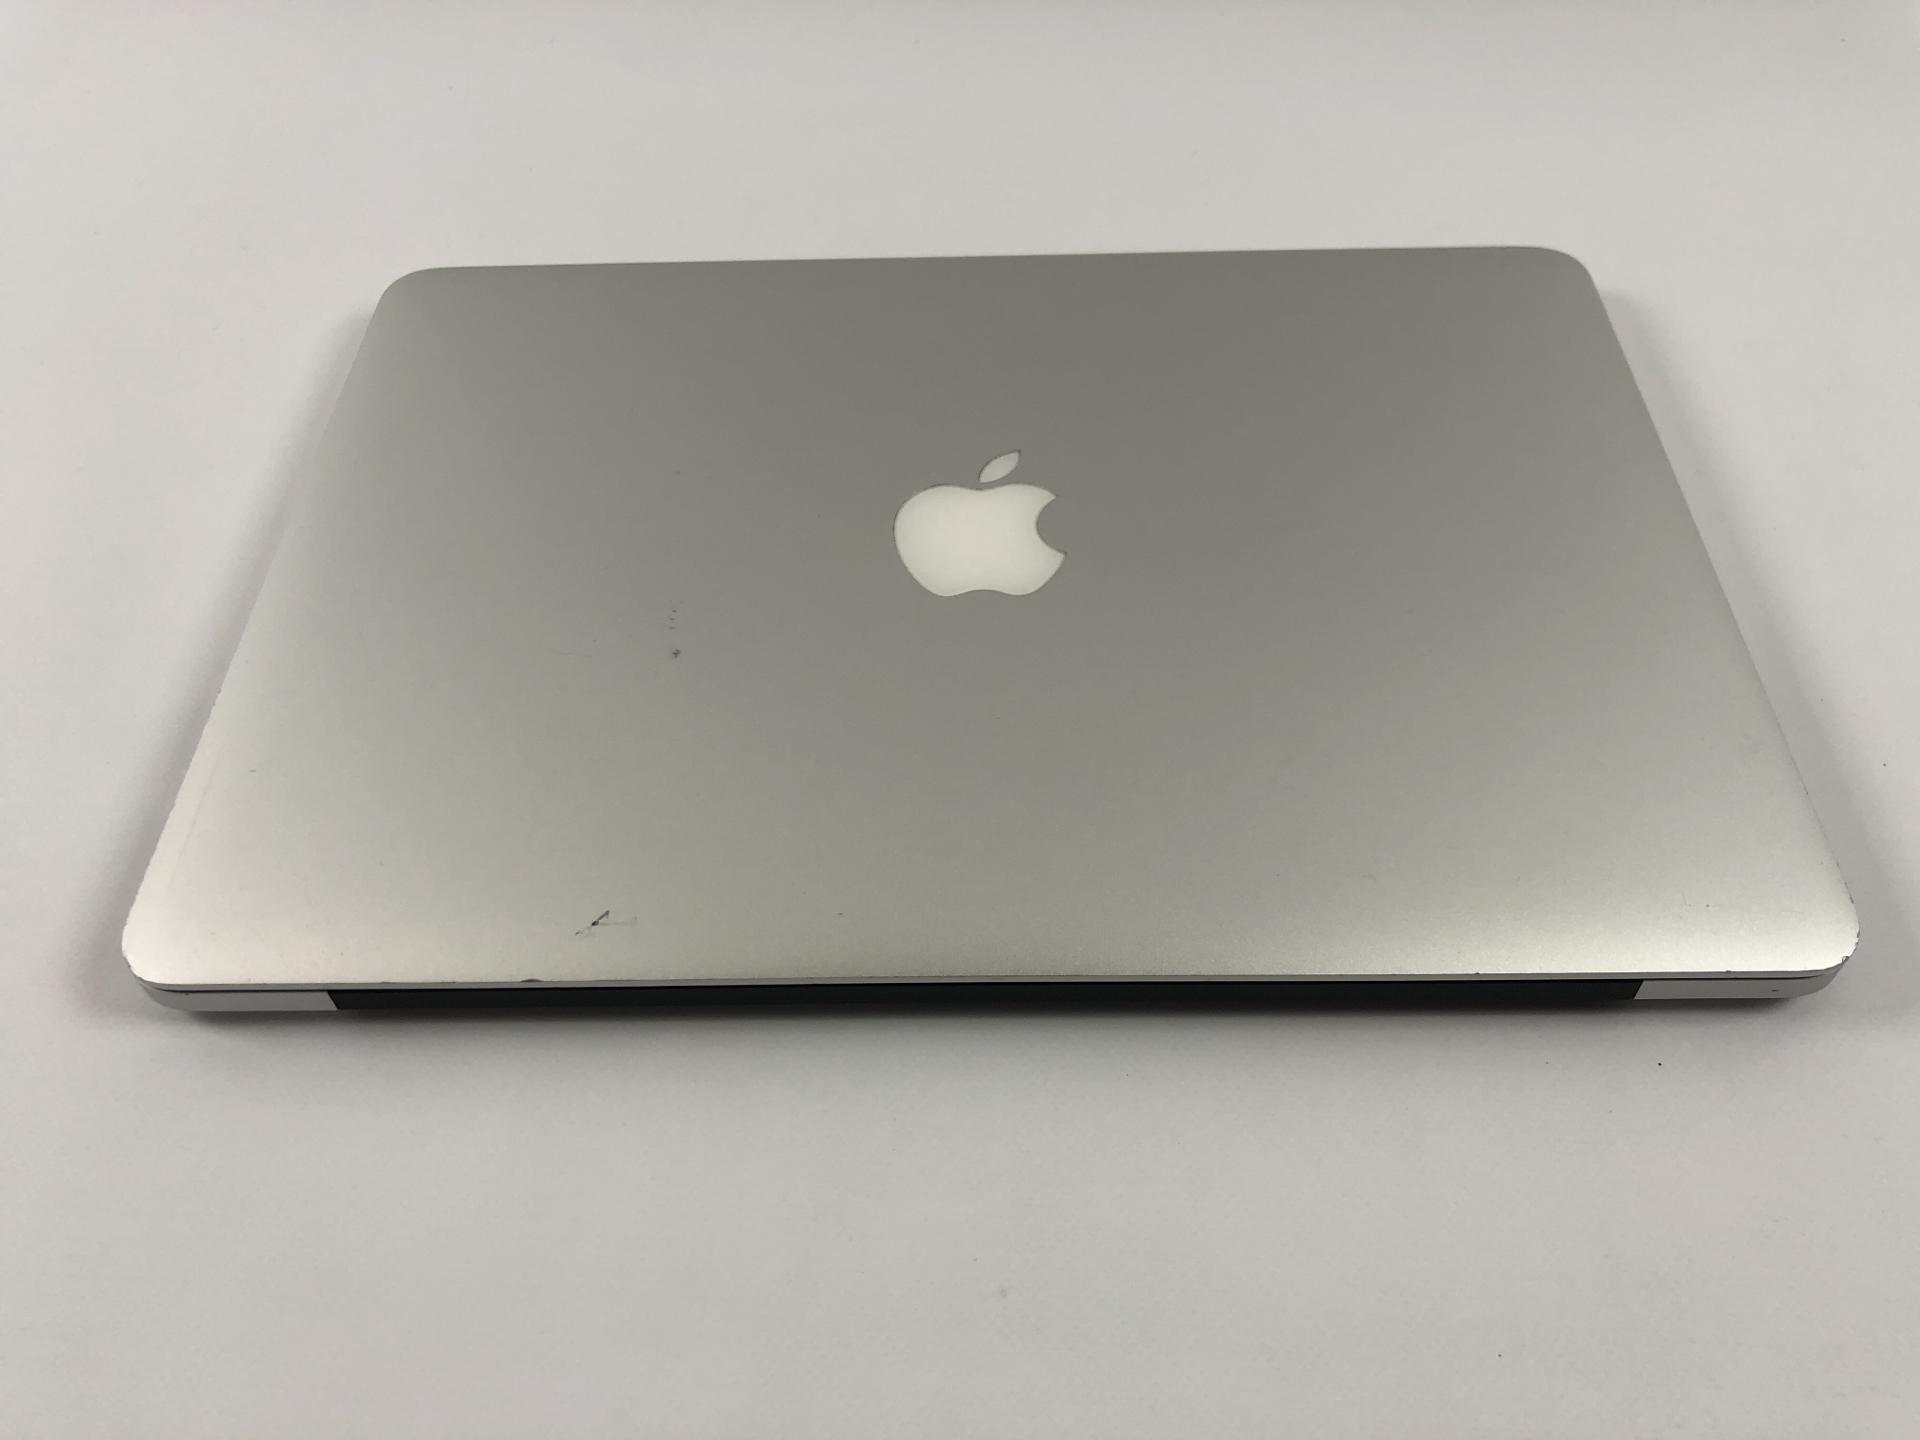 "MacBook Pro Retina 13"" Early 2015 (Intel Core i7 3.1 GHz 16 GB RAM 512 GB SSD), Intel Core i7 3.1 GHz, 16 GB RAM, 512 GB SSD, Bild 3"